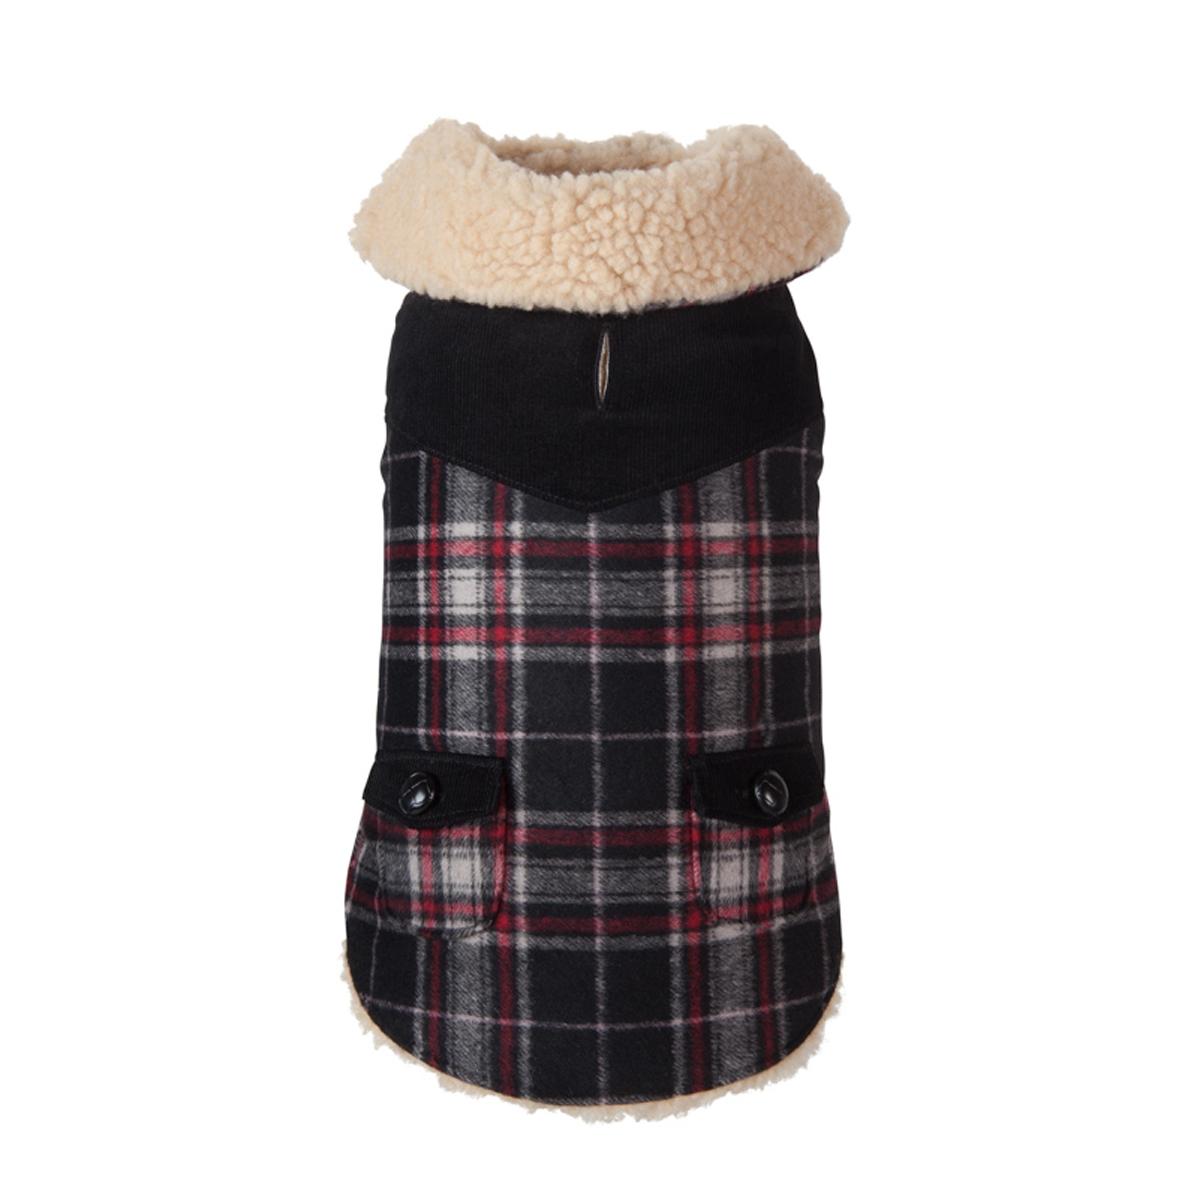 Wool Plaid Shearling Dog Jacket - Black